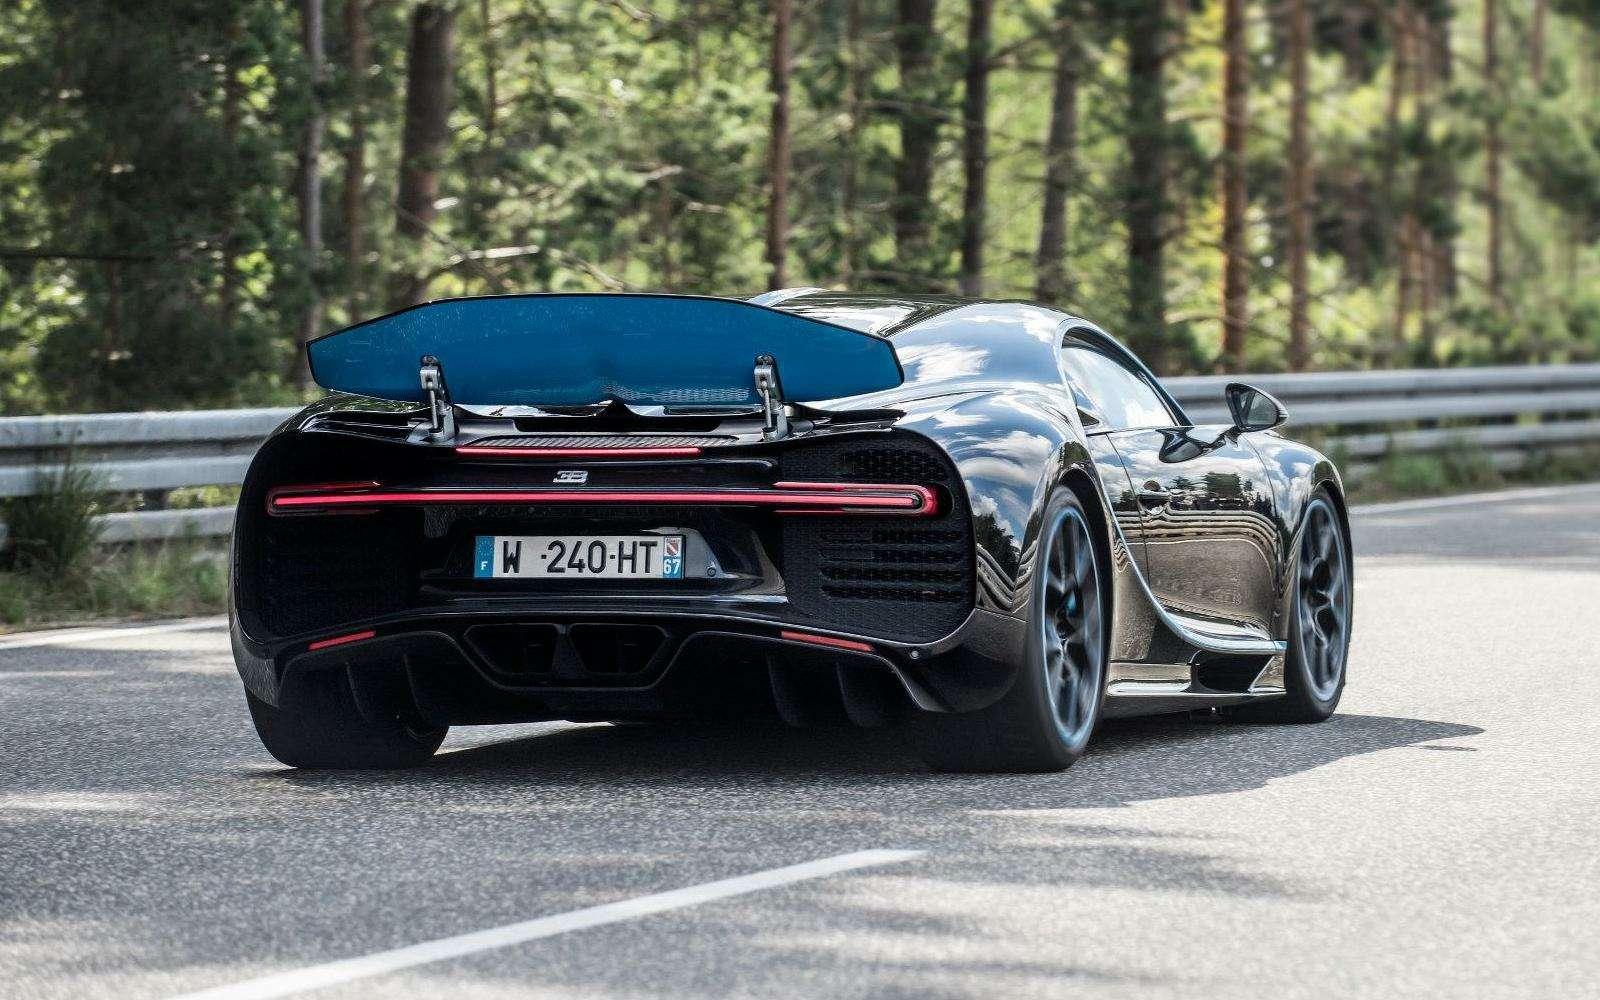 0-400-0 км/ч— видео рекордного заезда Bugatti Chiron— фото 794899